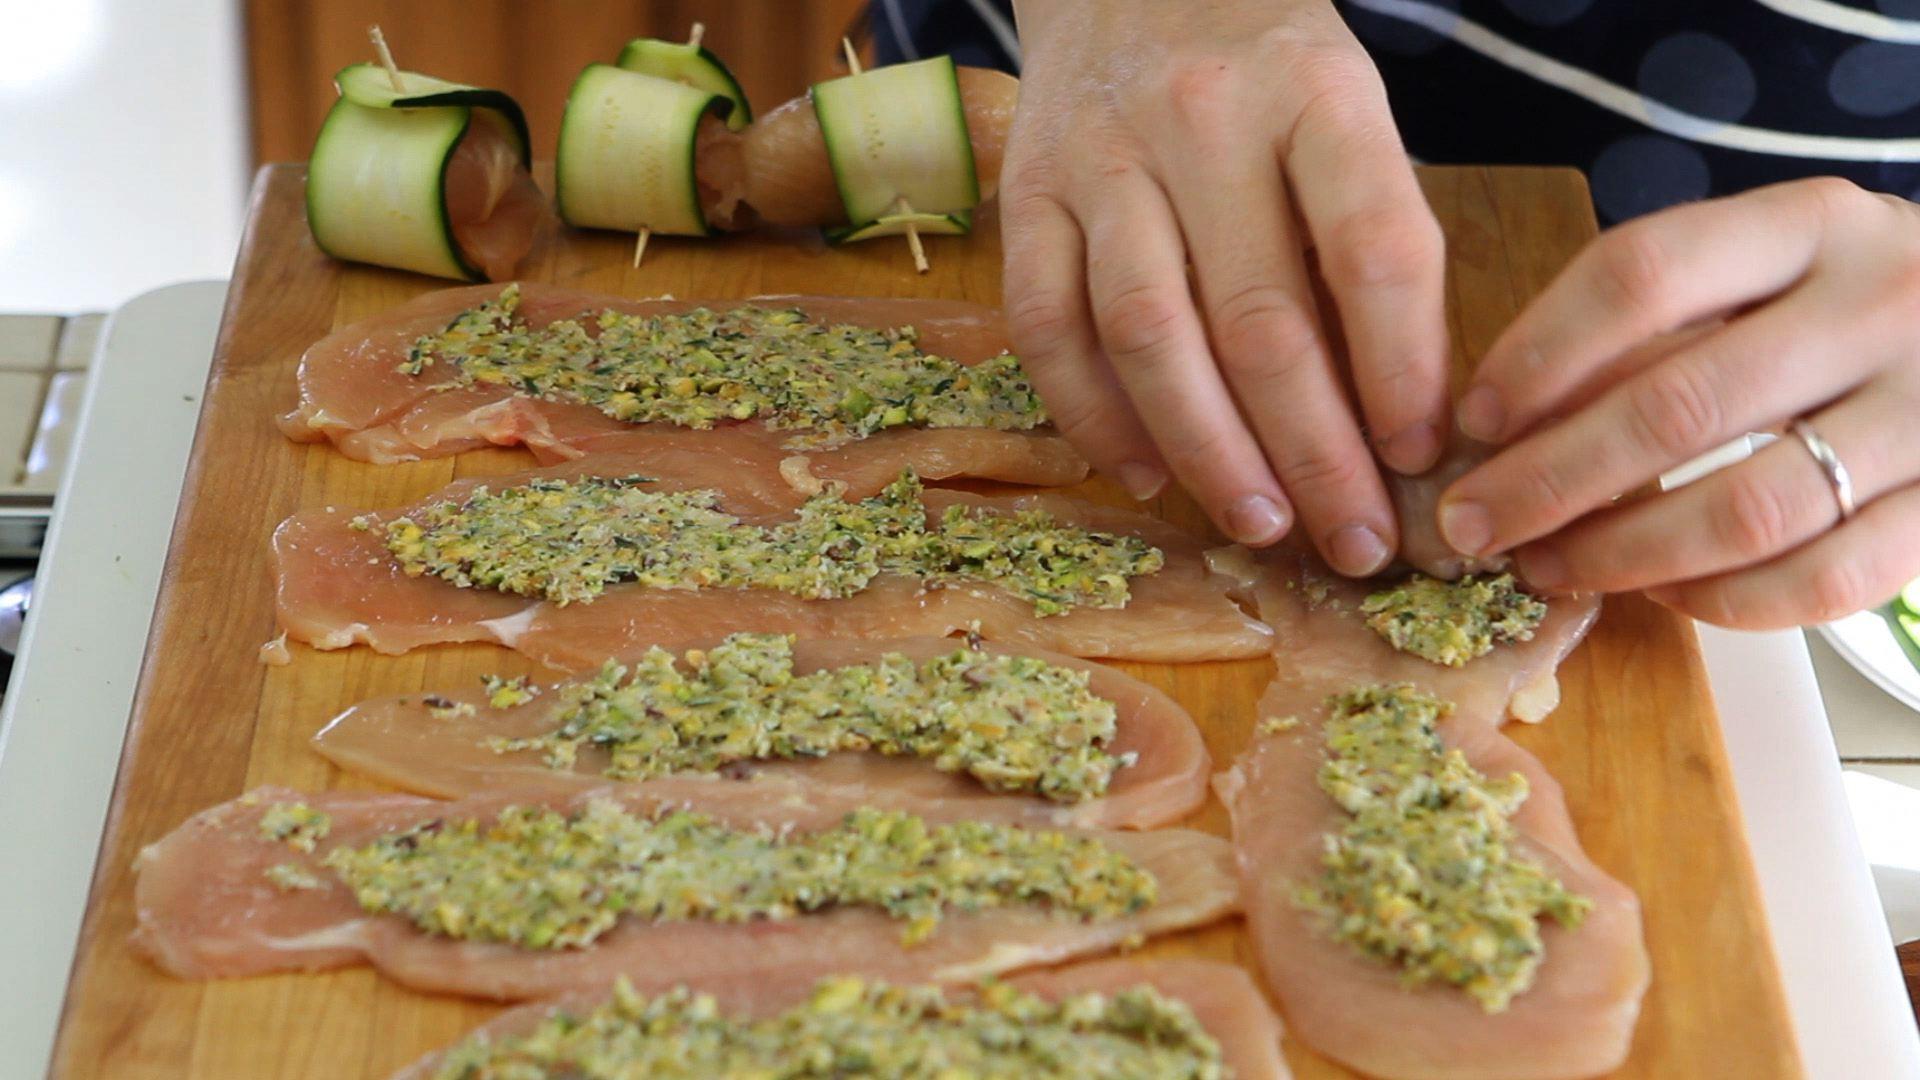 Zucchini And Chicken  Chicken bites with zucchini and pistachio